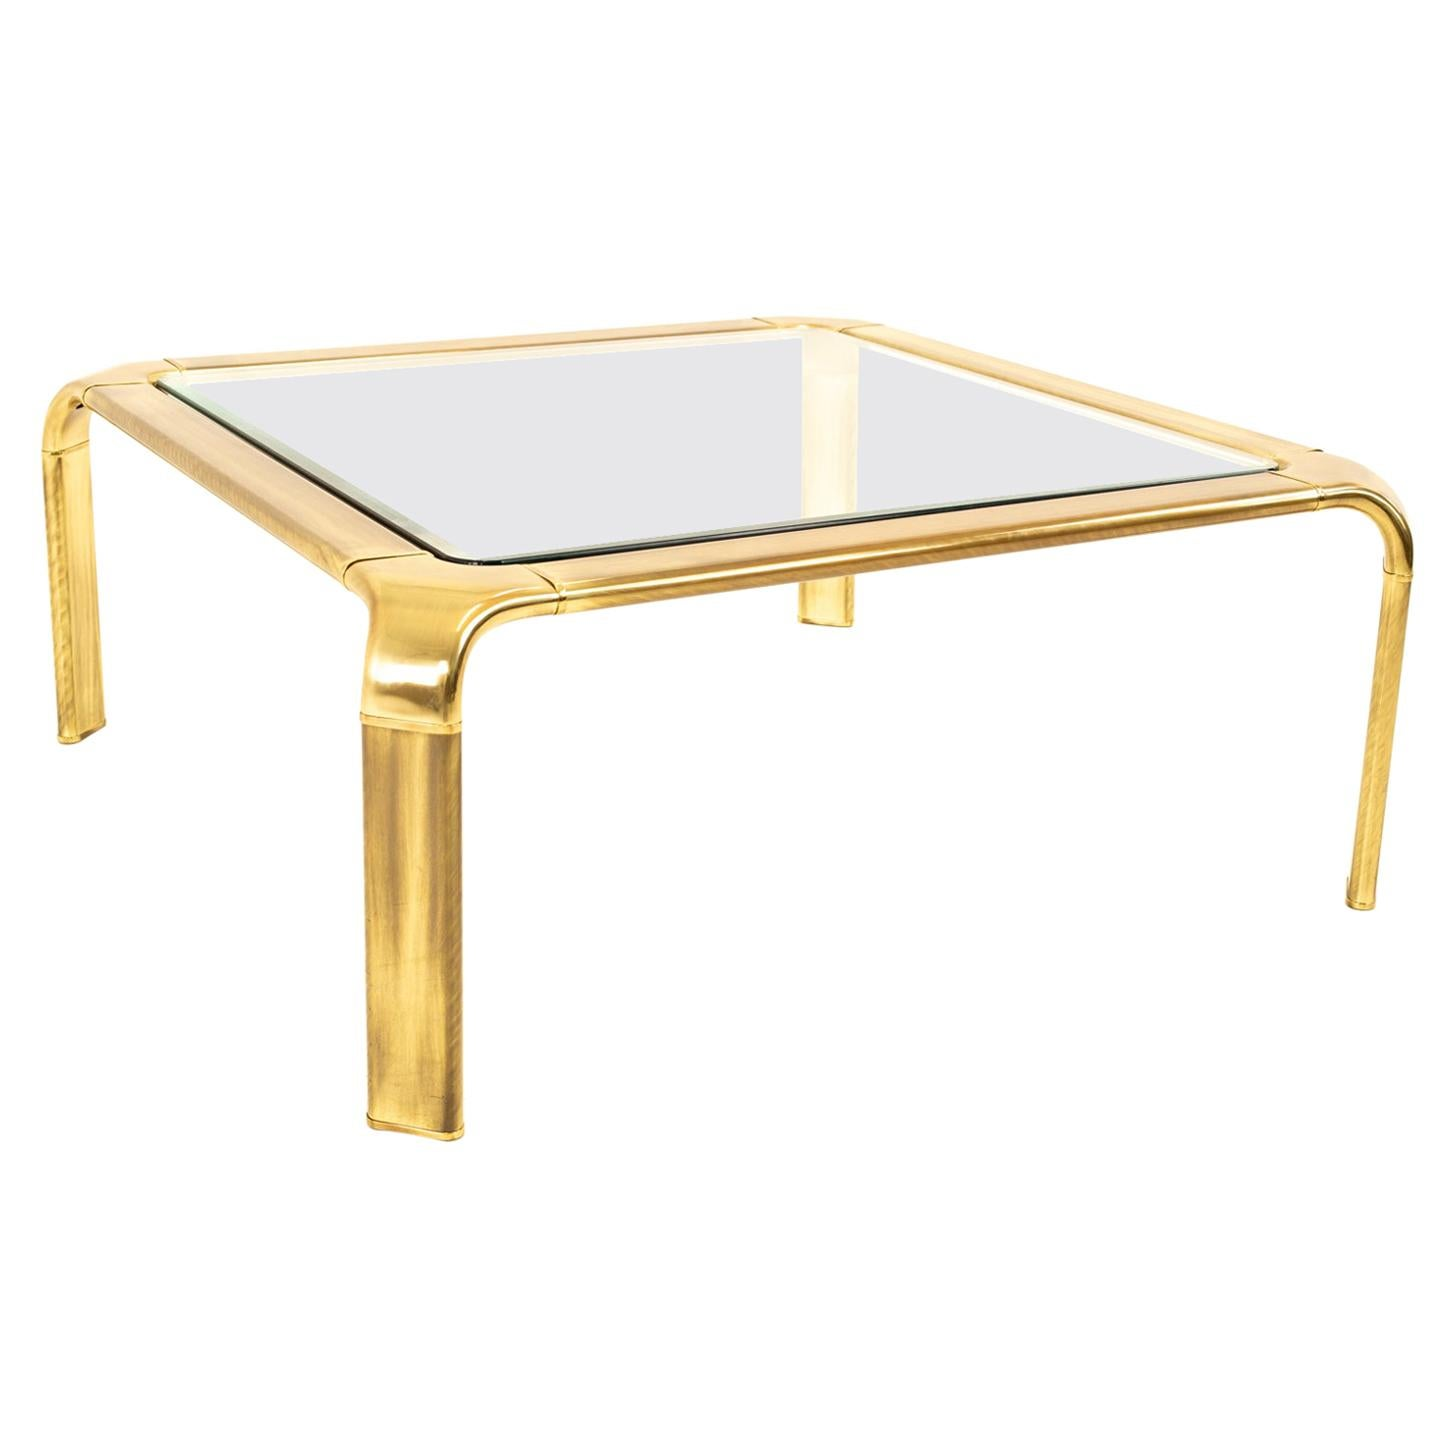 Mastercraft Brass Mid Century Coffee Table